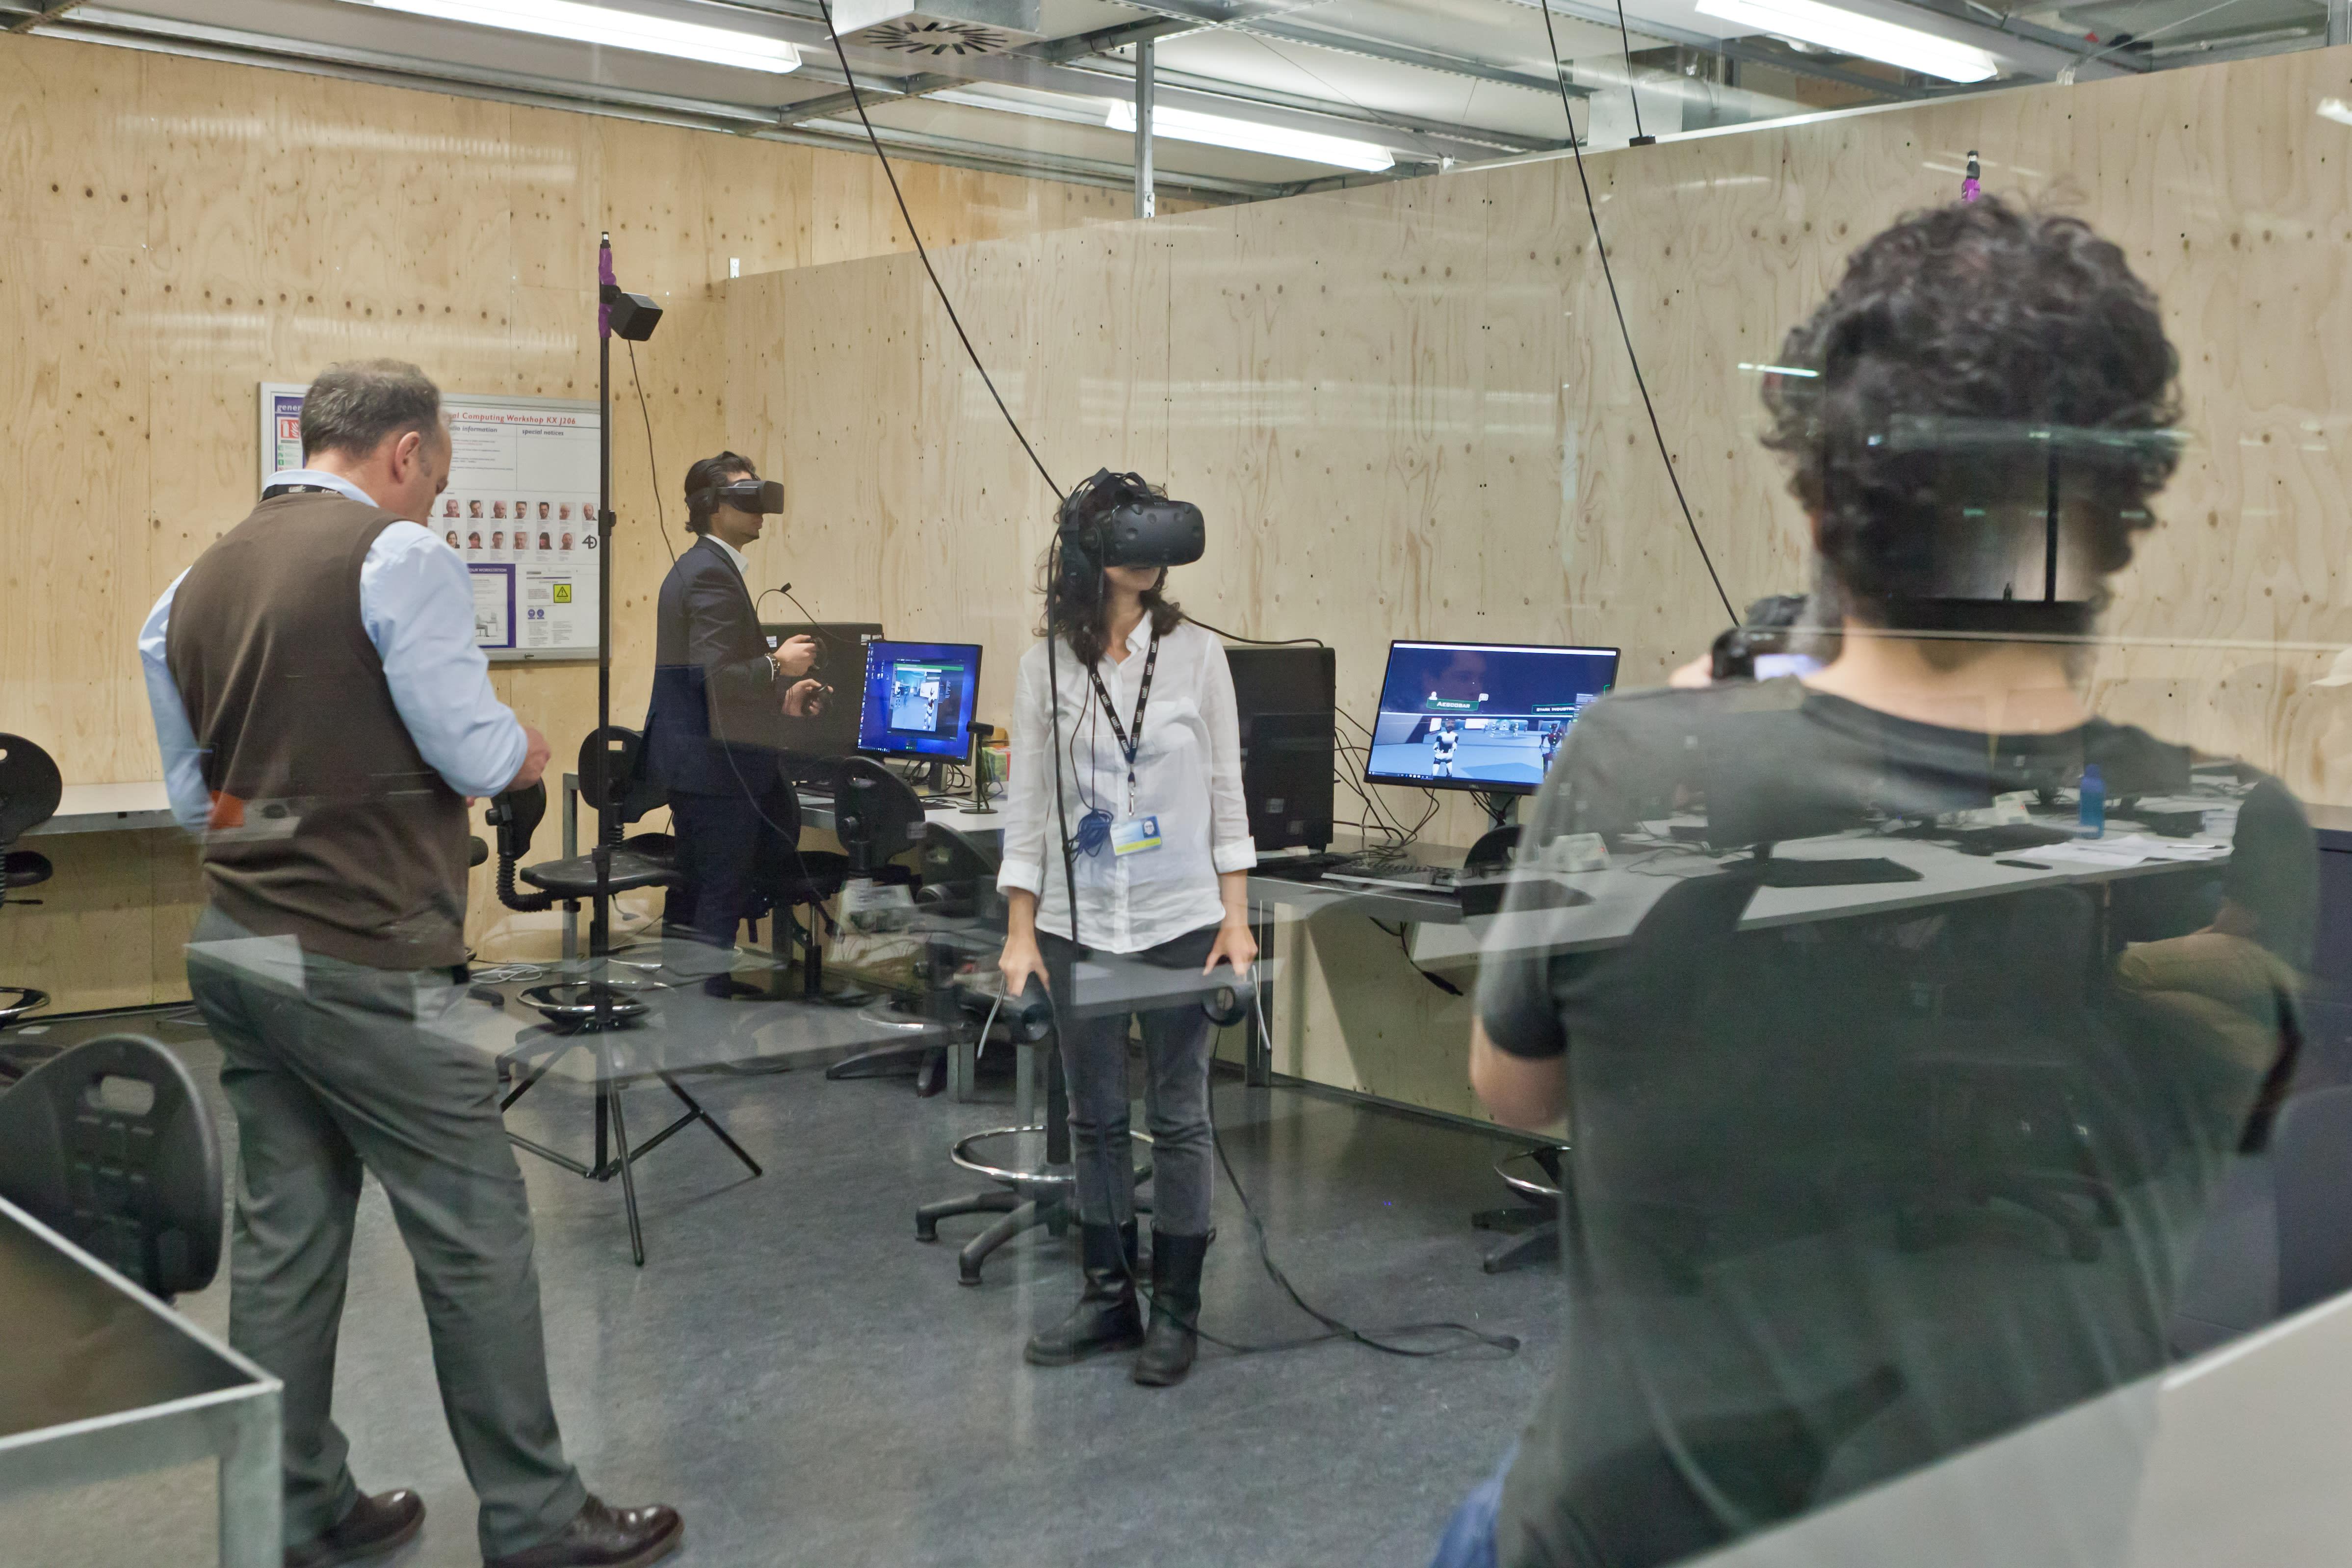 MA-ACE-Virtual-Reality-Conference-34.jpg